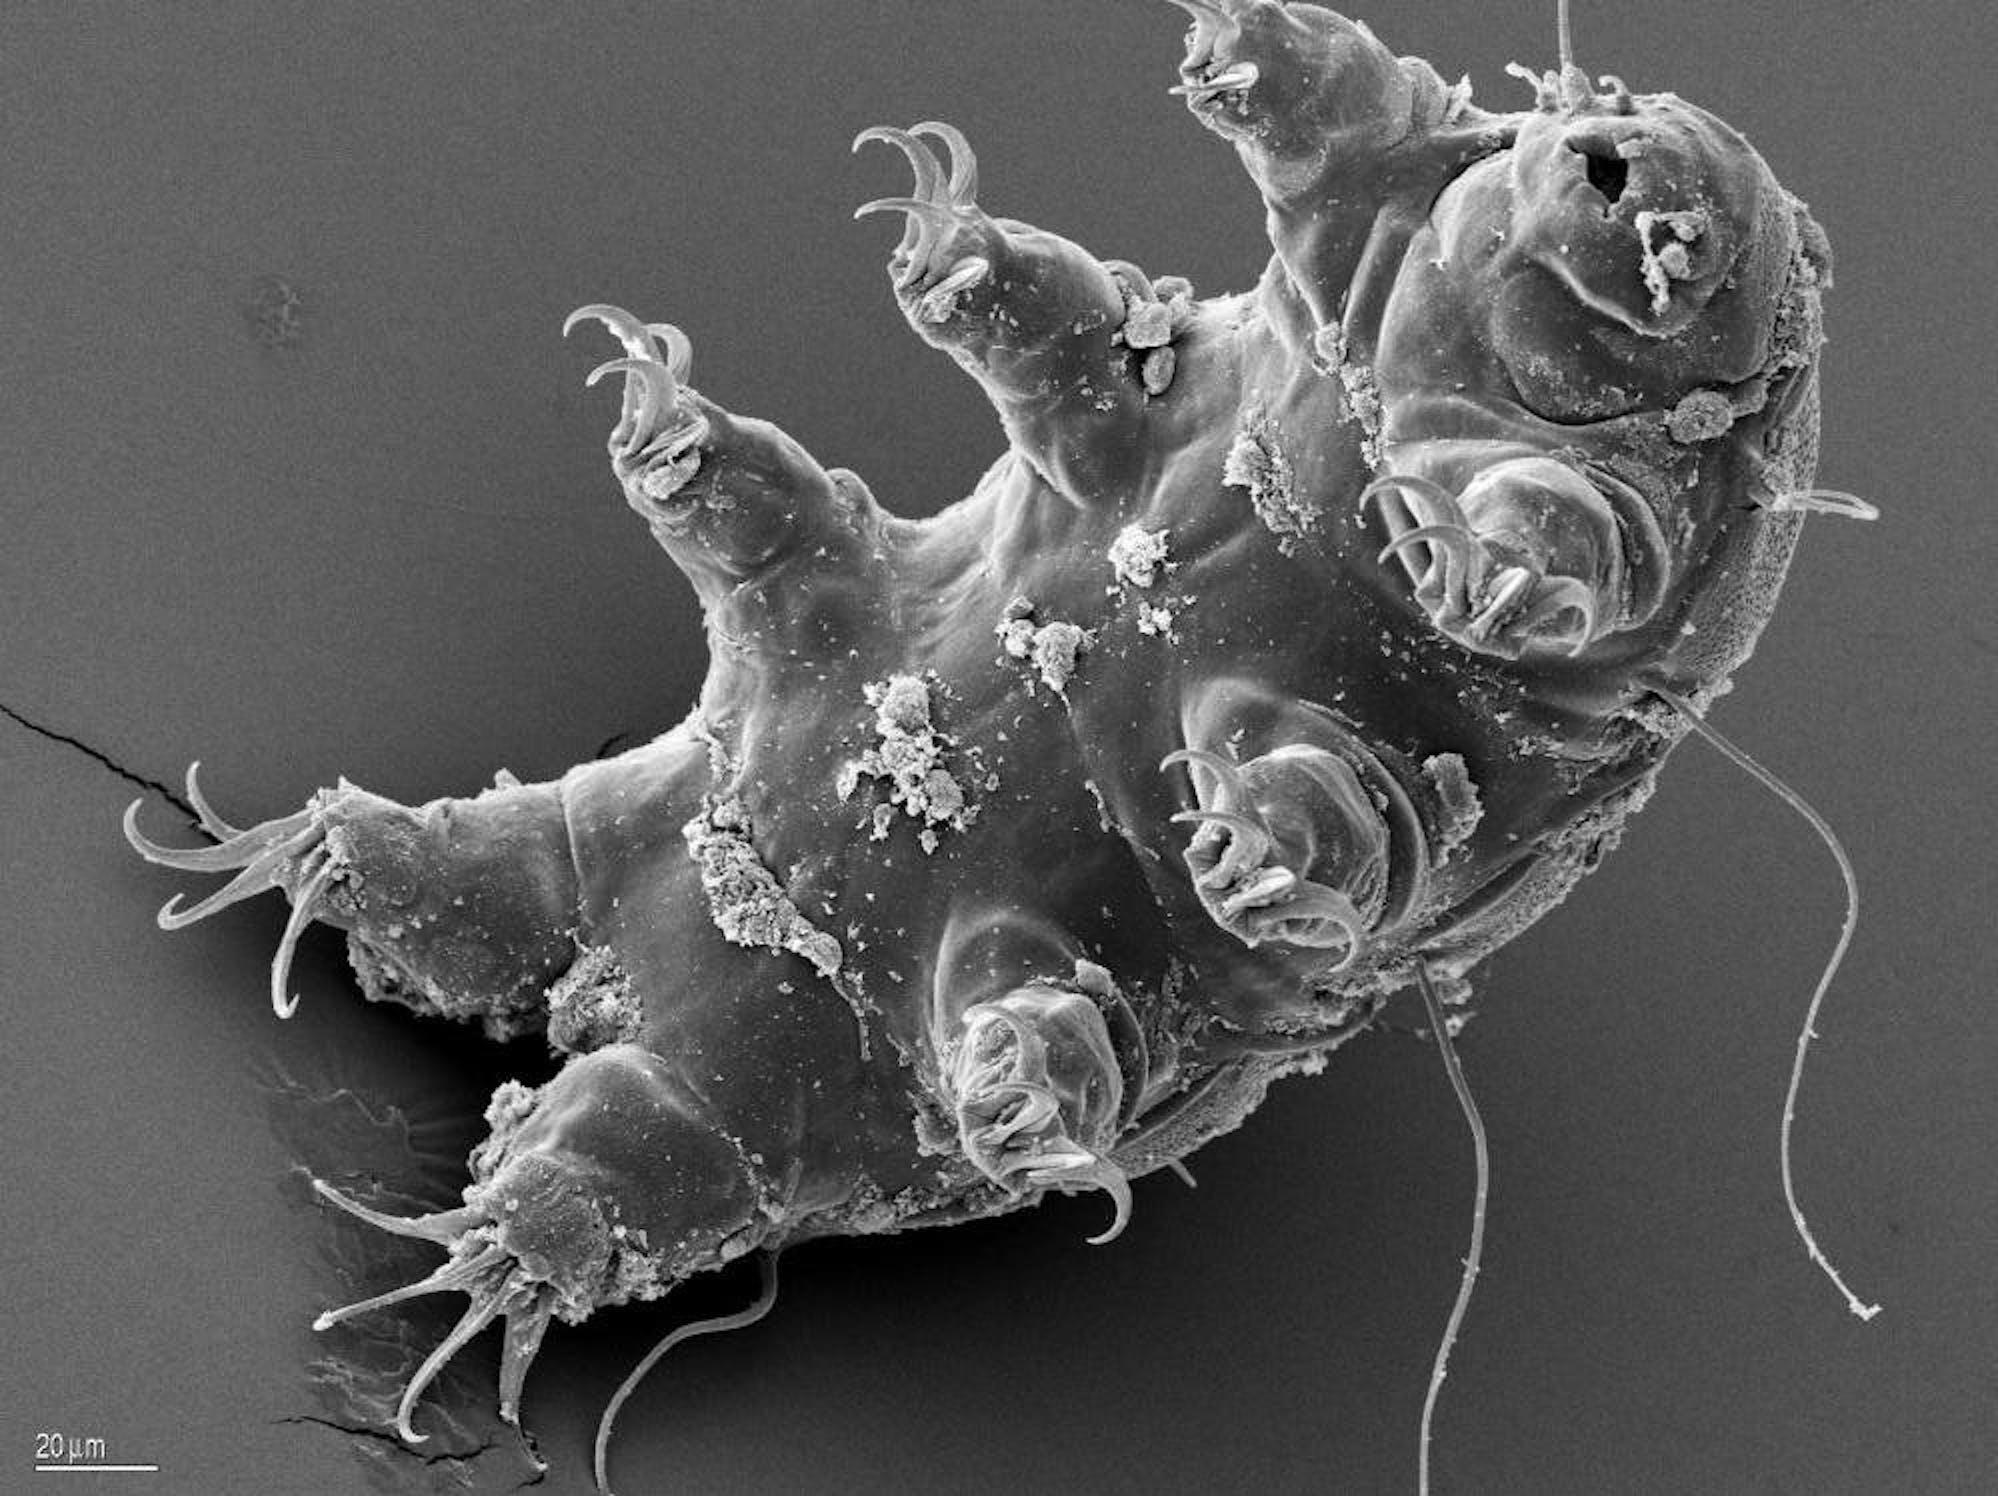 microbiomes Tardigrade bill miller esa nasa